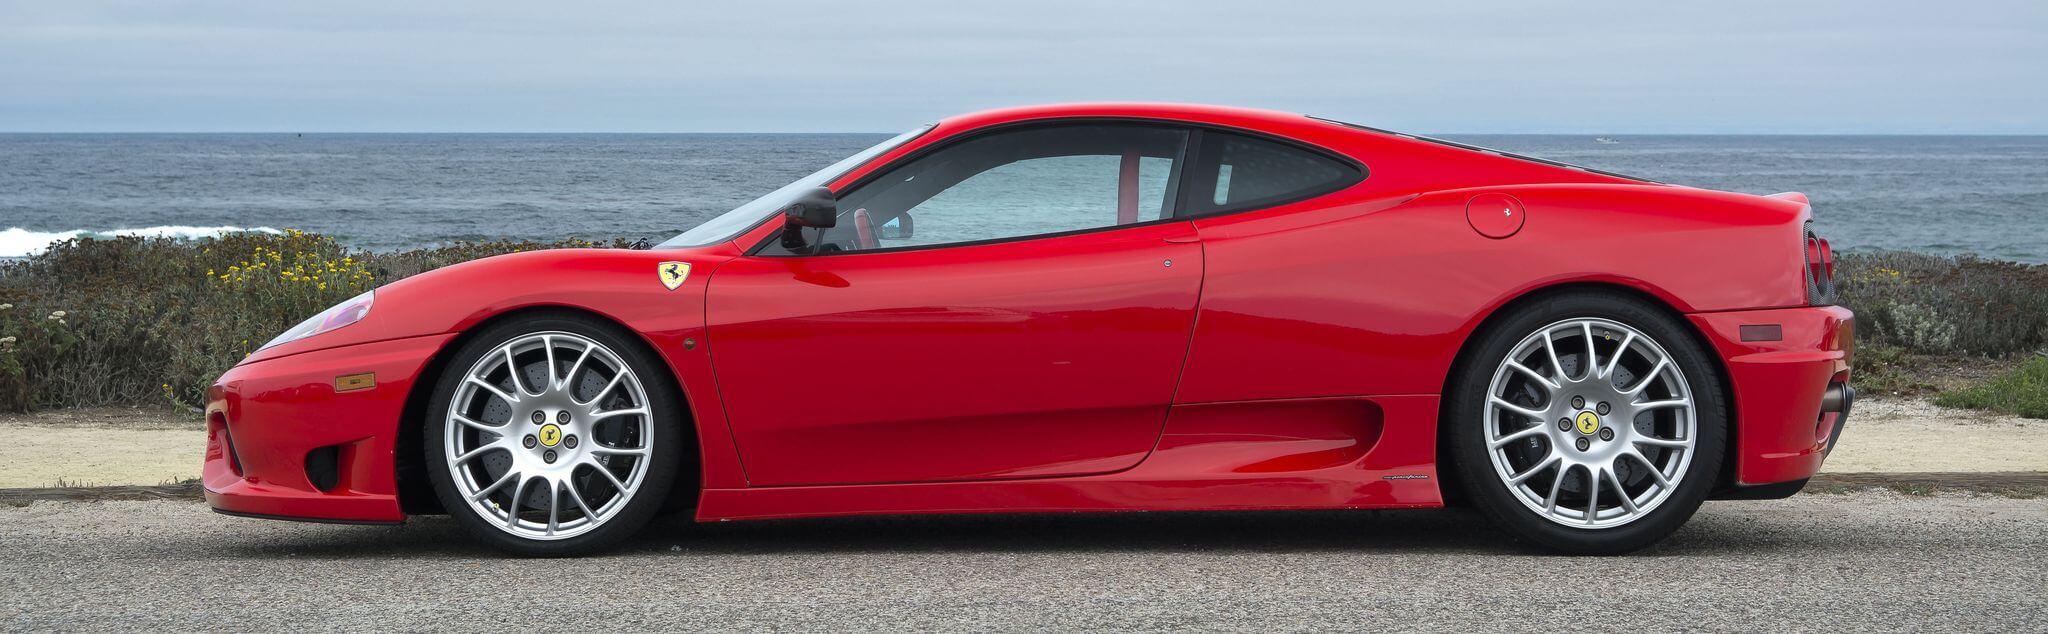 Guidare una Ferrari a Ortona